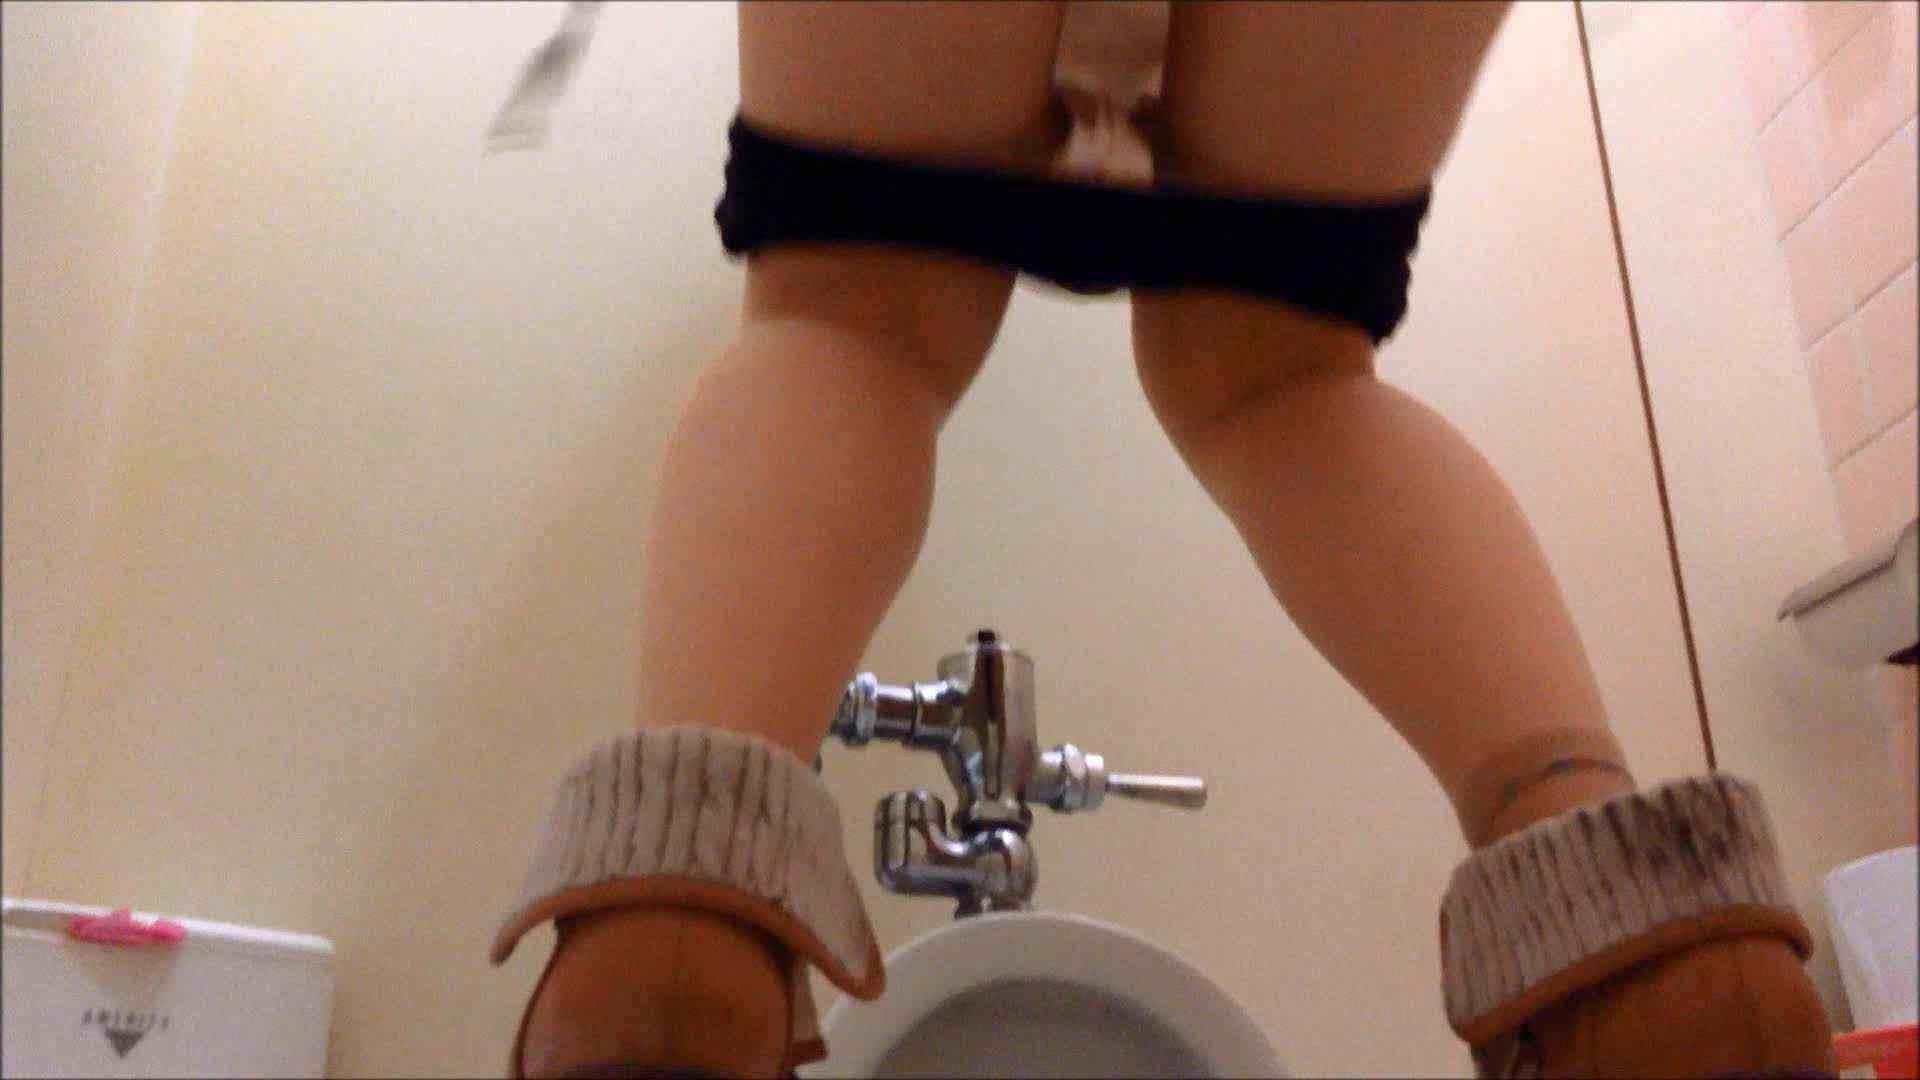 某有名大学女性洗面所 vol.14 和式 のぞき 105PIX 39